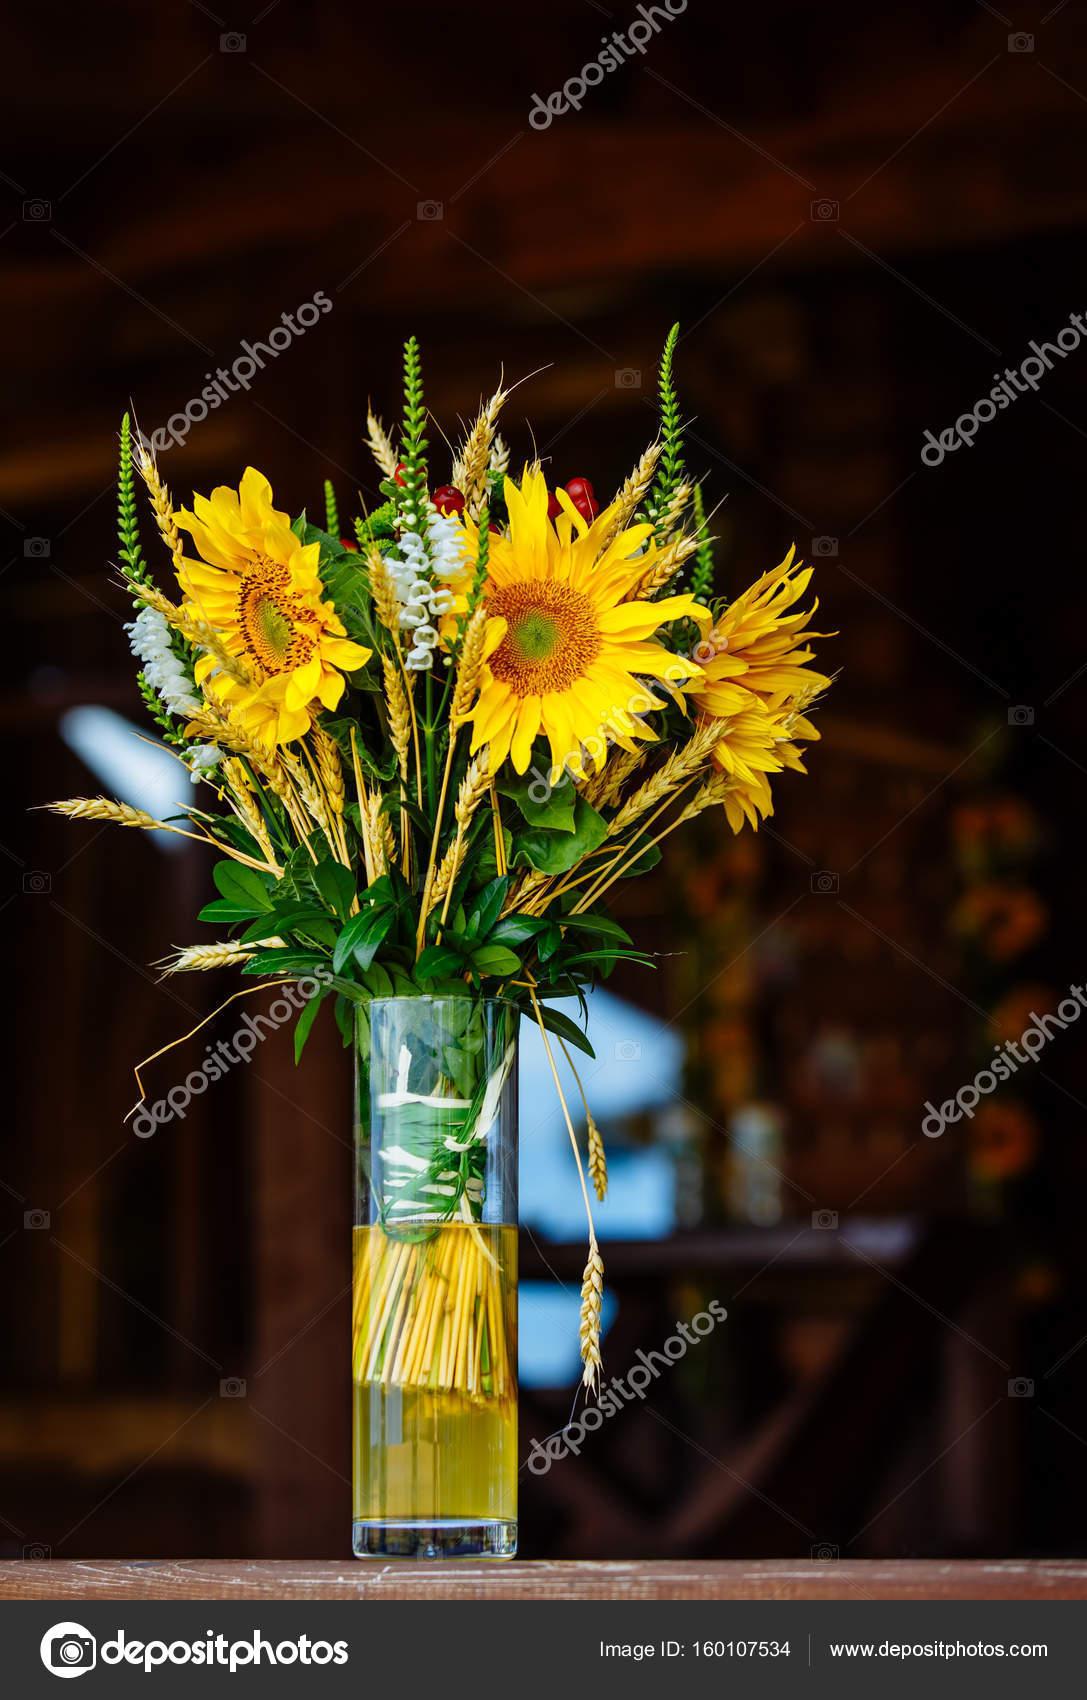 Arreglo Floral Verano Colorido Con Girasol Foto De Stock